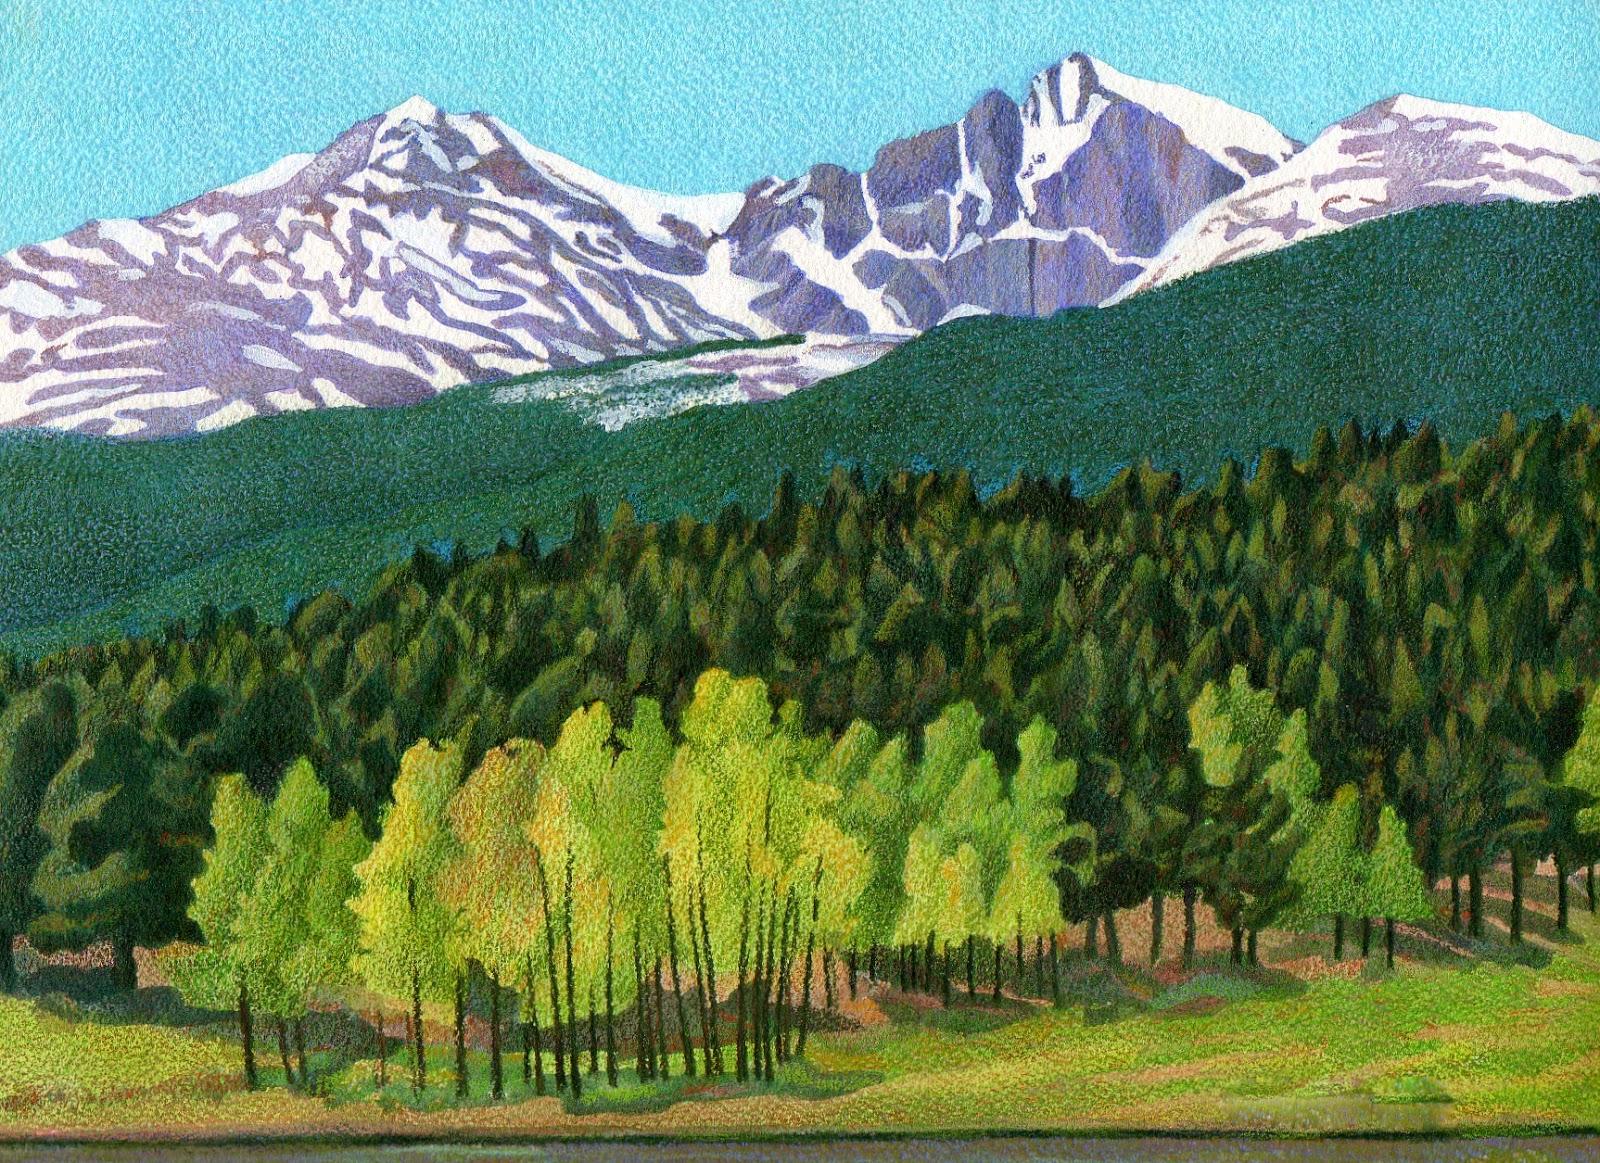 Impression Evergreen: Longs Peak - Colored Pencil Drawing